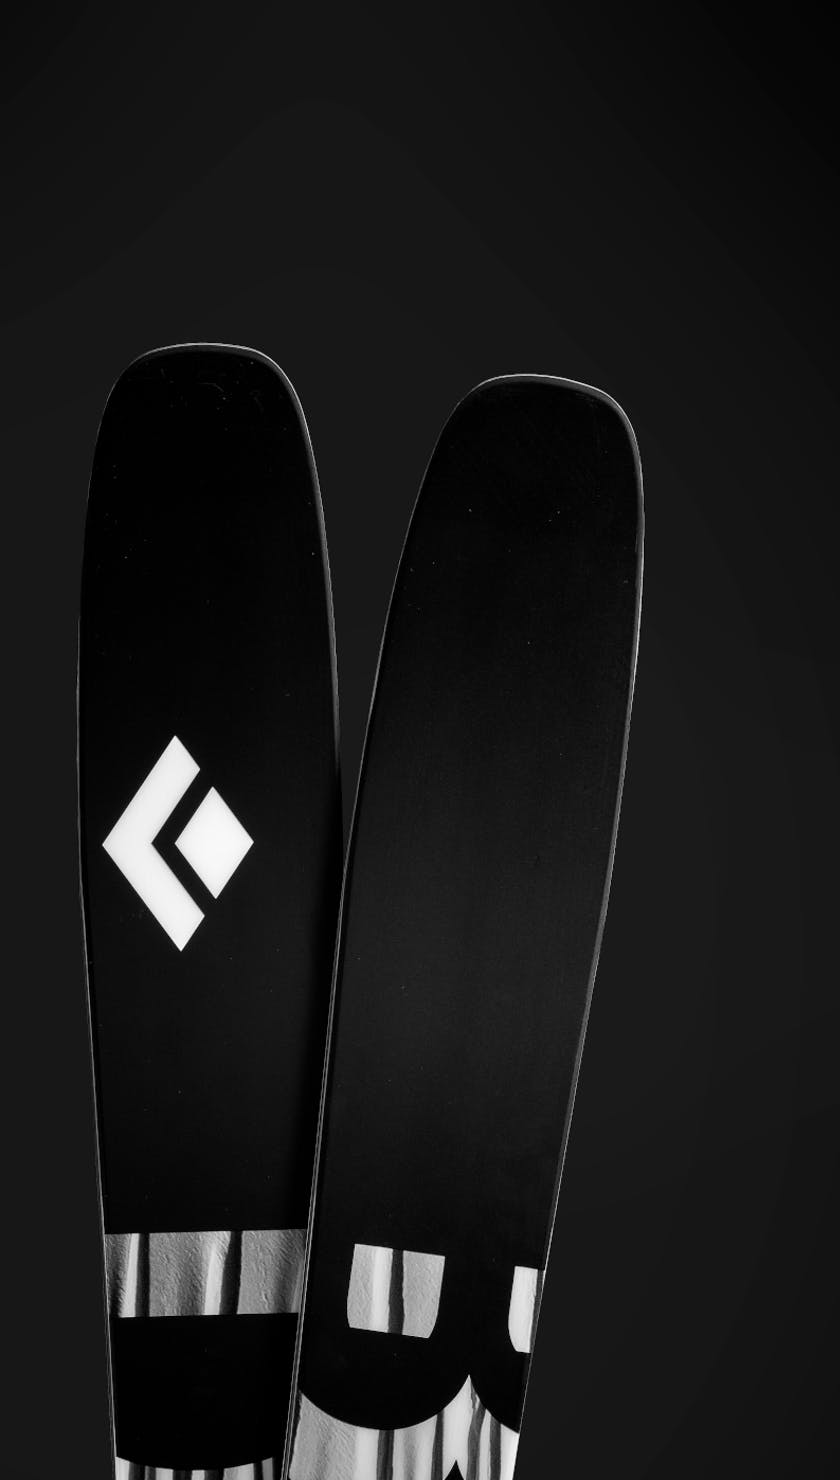 The new Black Diamond Impulse 104 ski.